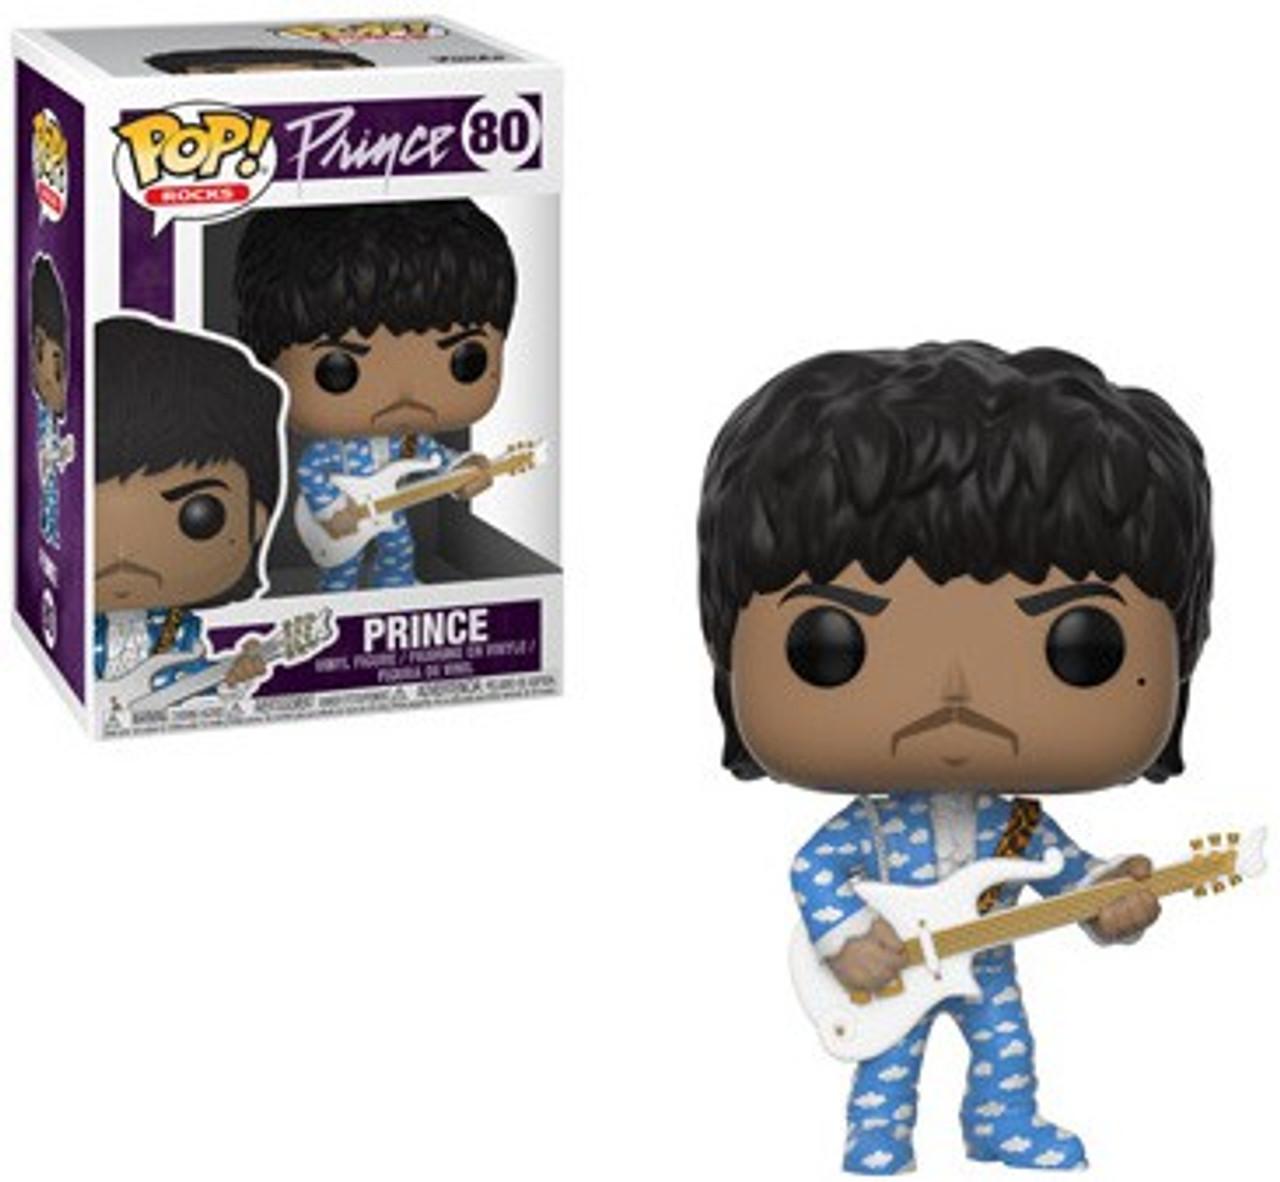 eecde117d10 Funko Prince Funko POP Rocks Prince Vinyl Figure 80 Around the World -  ToyWiz